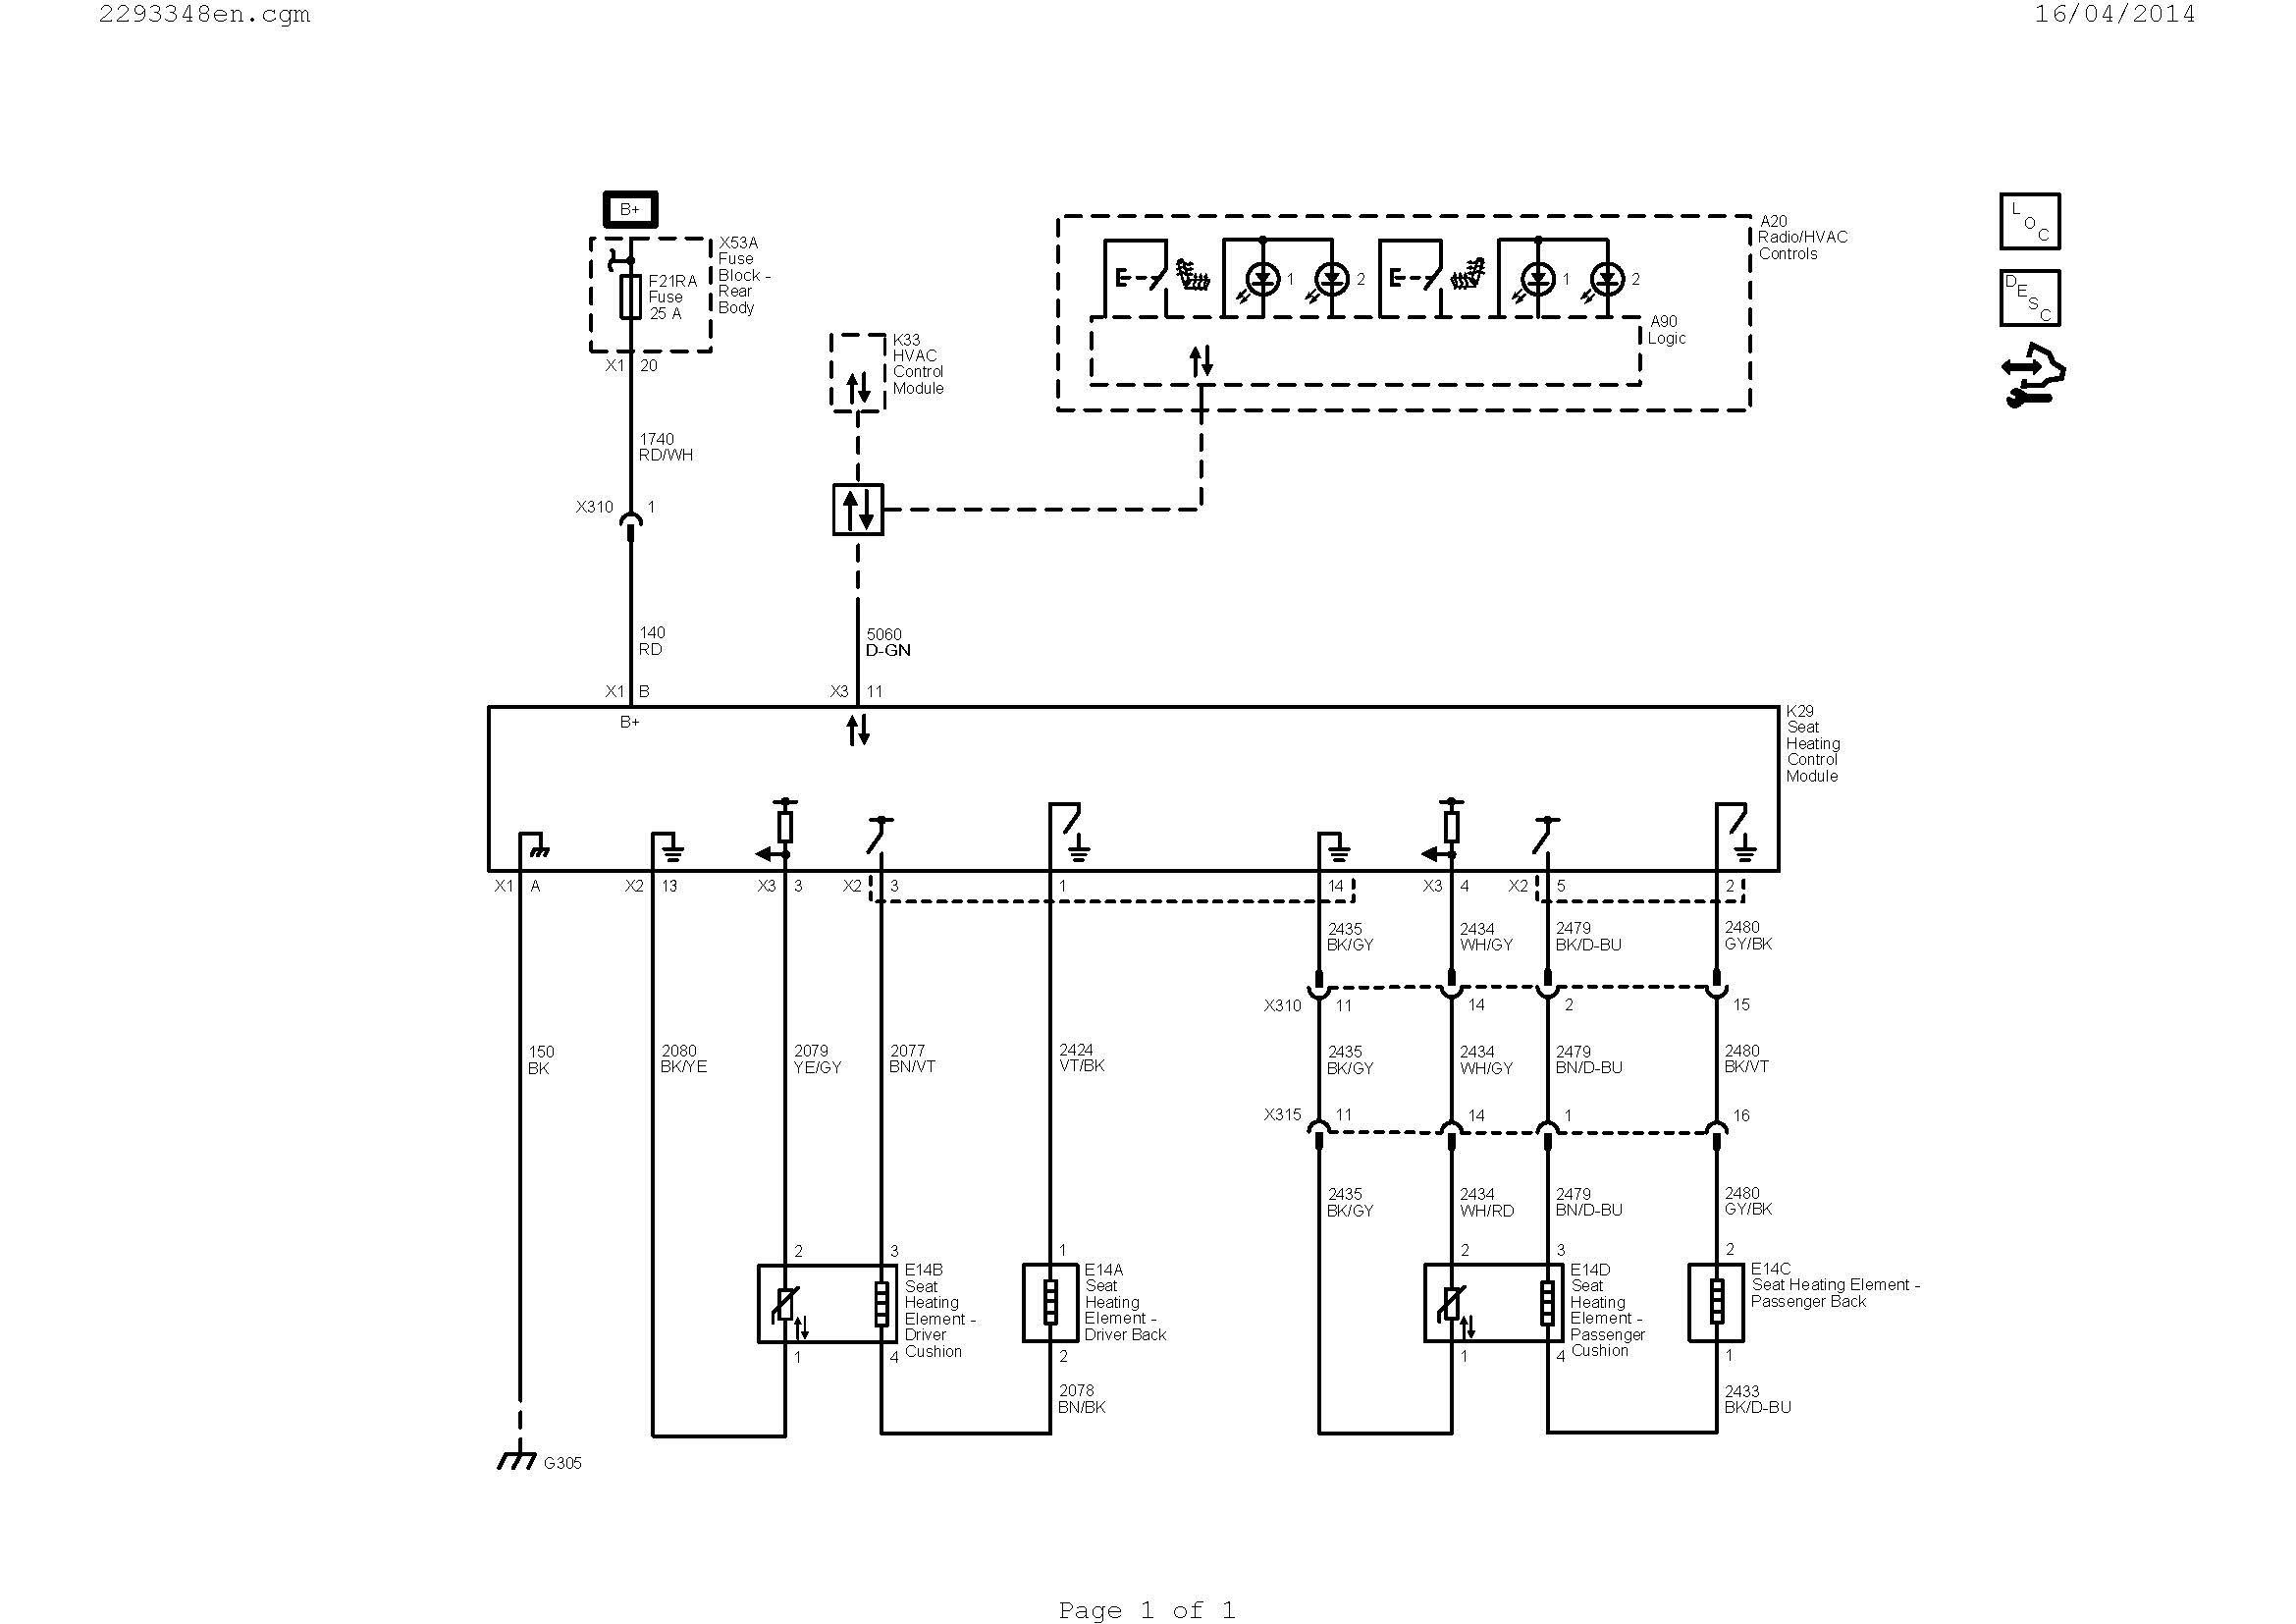 Sprinkler System Wiring Diagram